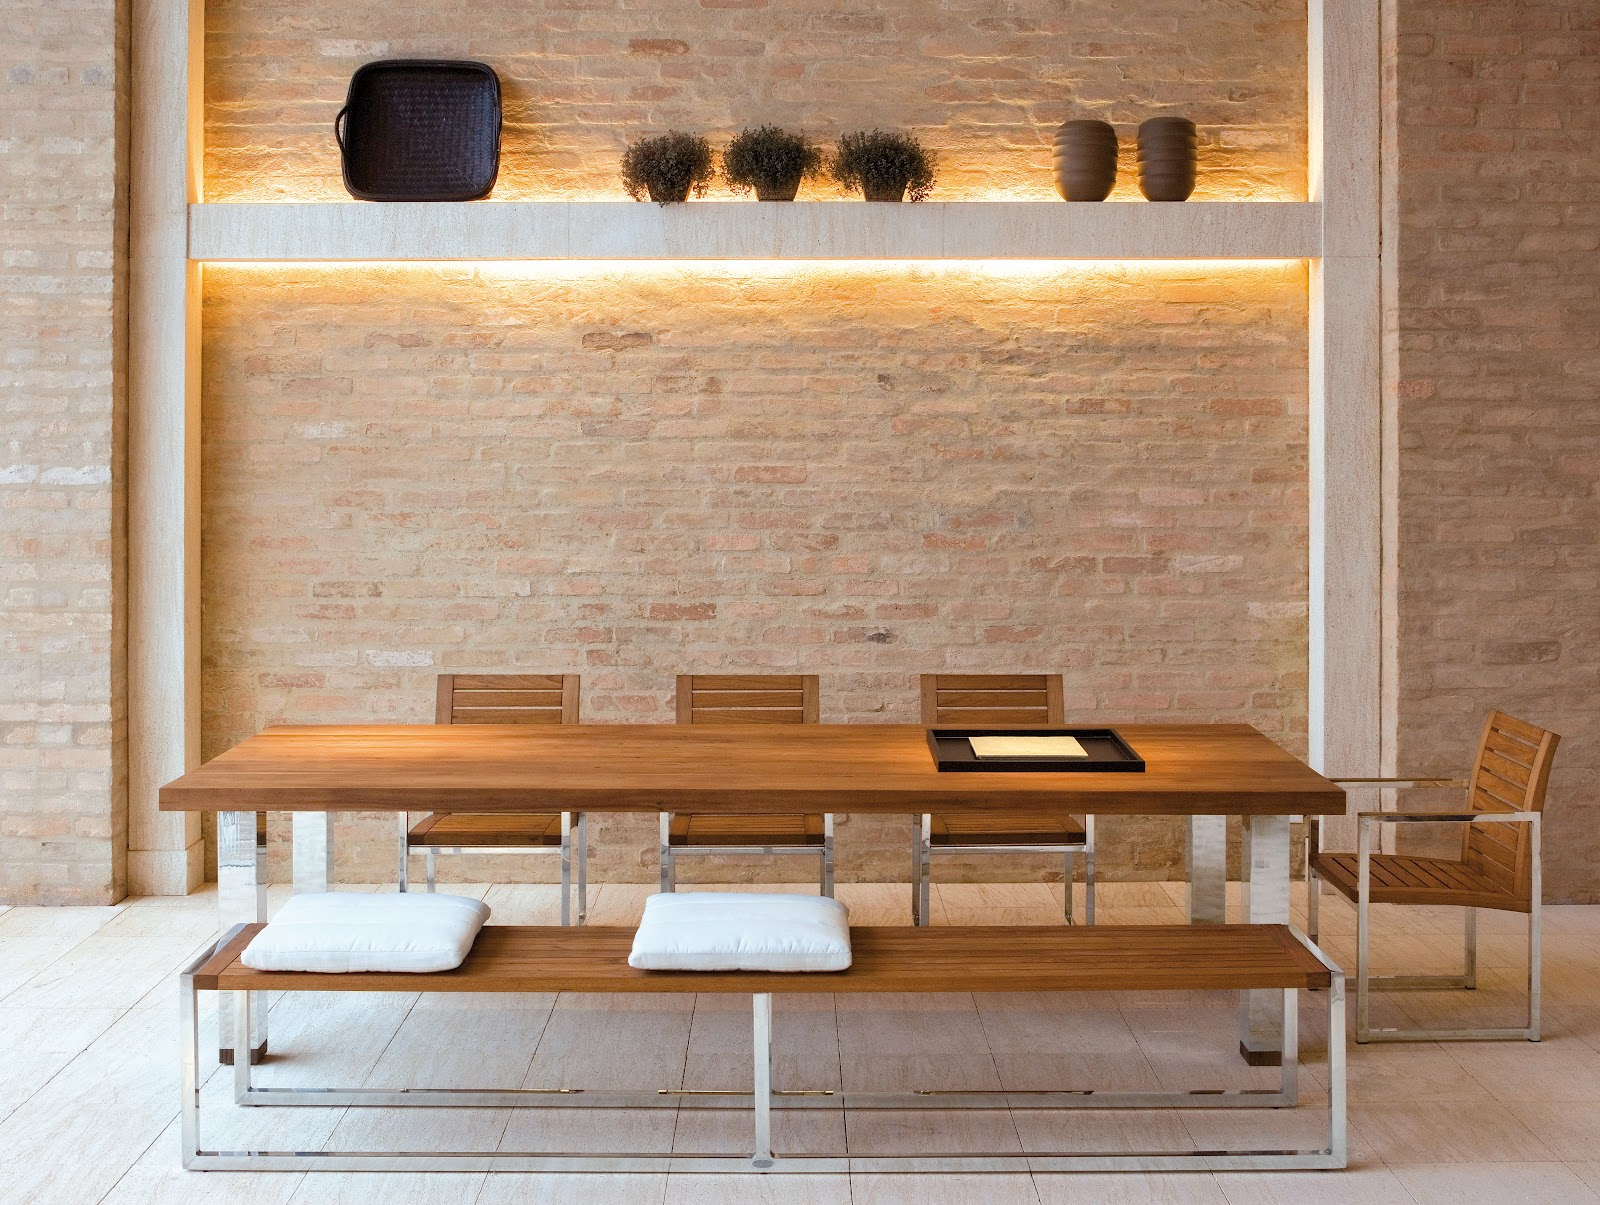 Luxo Simples Assim: Cassio Veiga tem showroom Franccino #BE770D 1600x1205